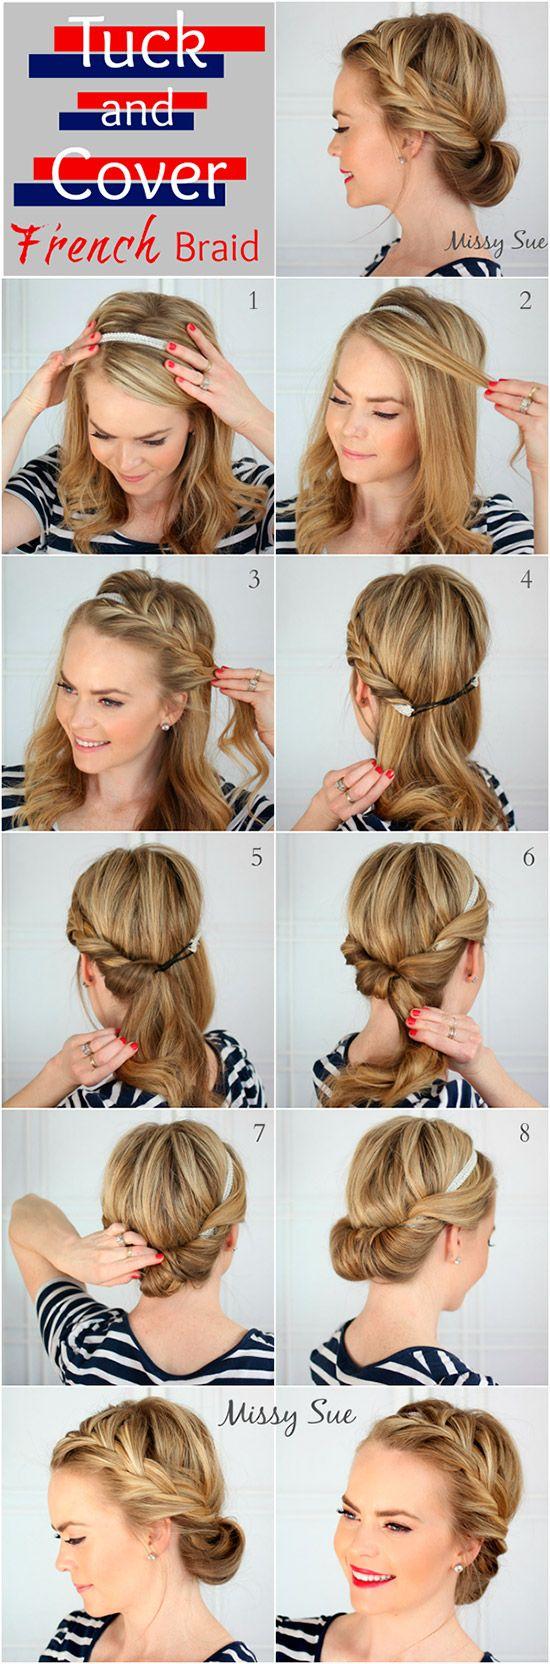 tutoriales de peinados fáciles para cabello largo o mediano hair